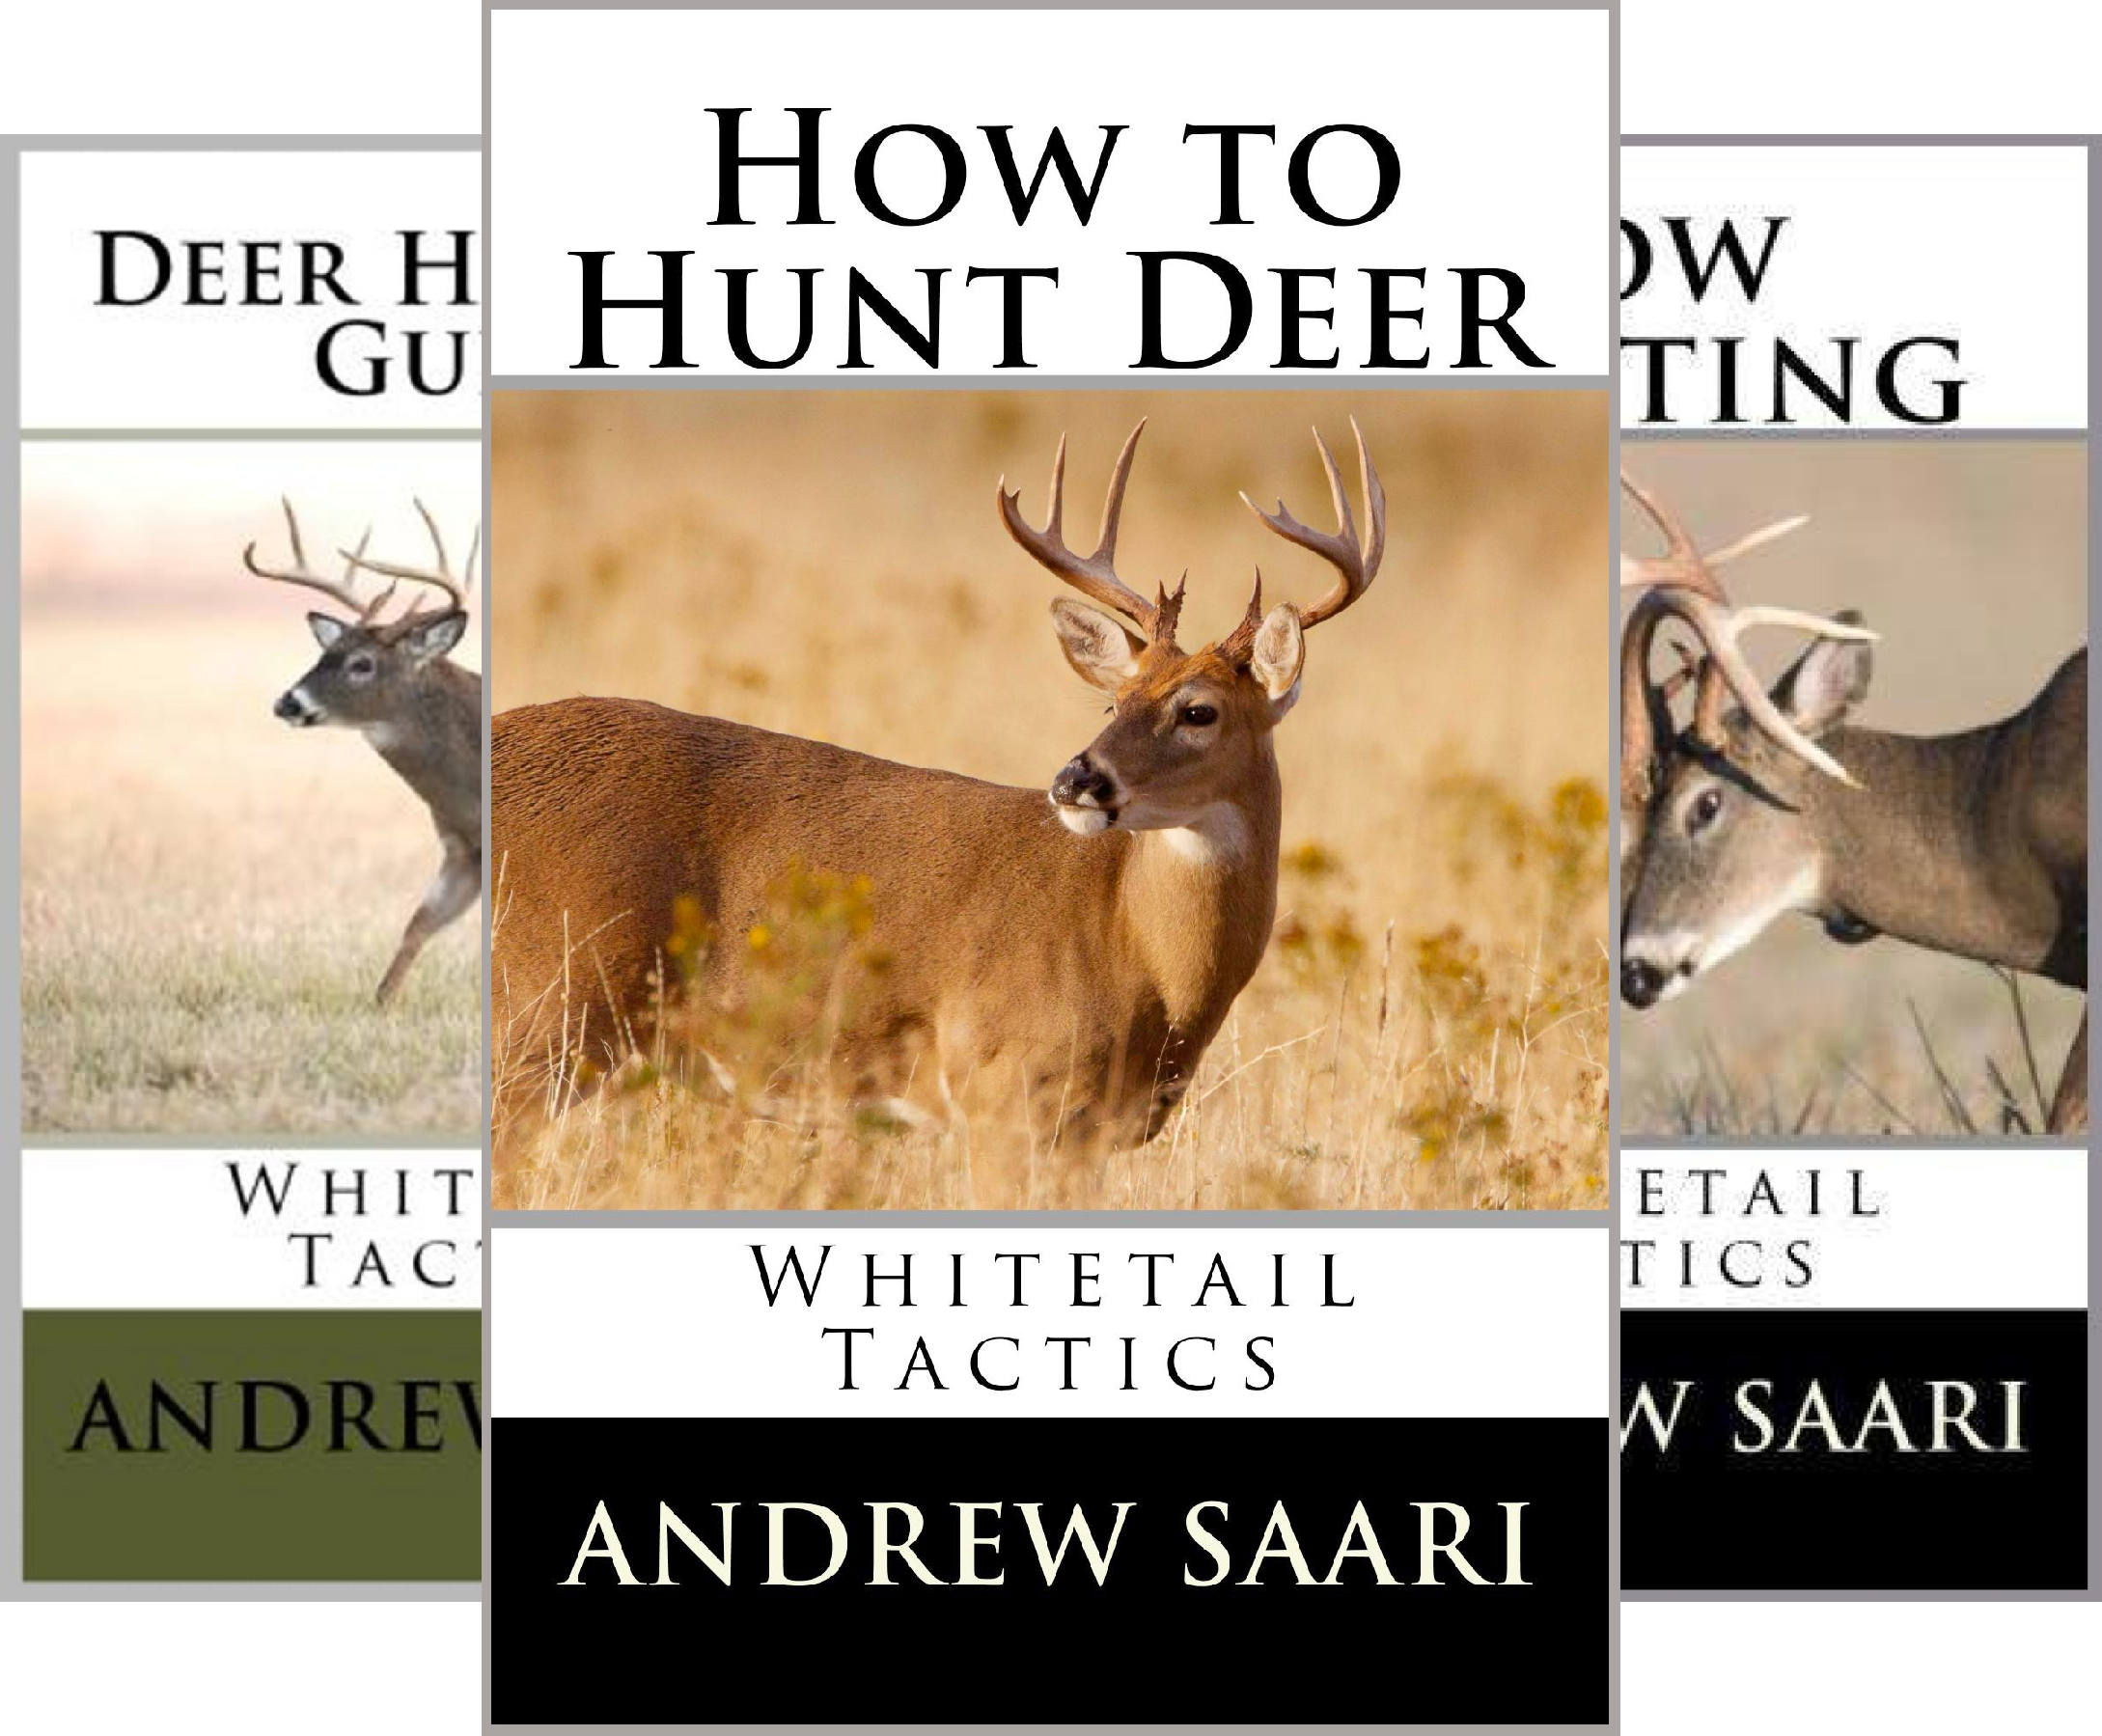 Whitetail Tactics (3 Book Series)